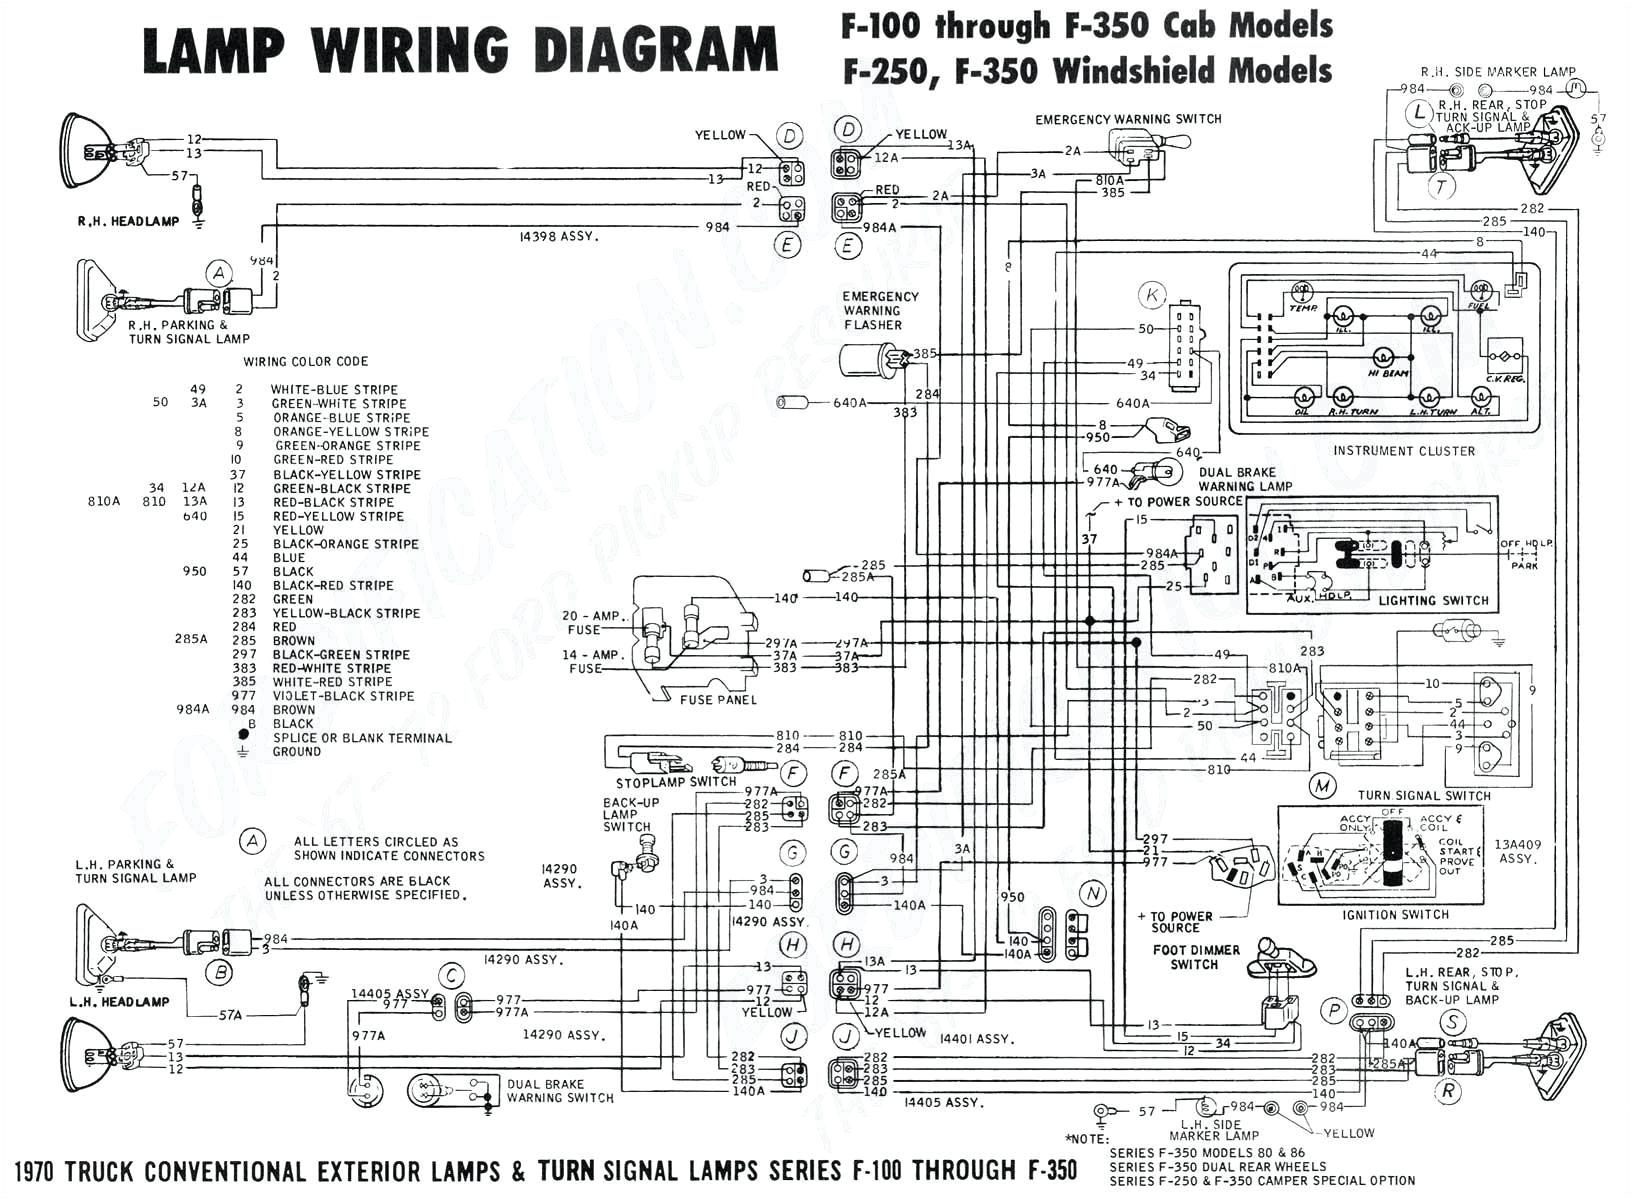 Moritz Trailer Wiring Diagram Free Oldsmobile Wiring Diagram Wiring Diagram Show